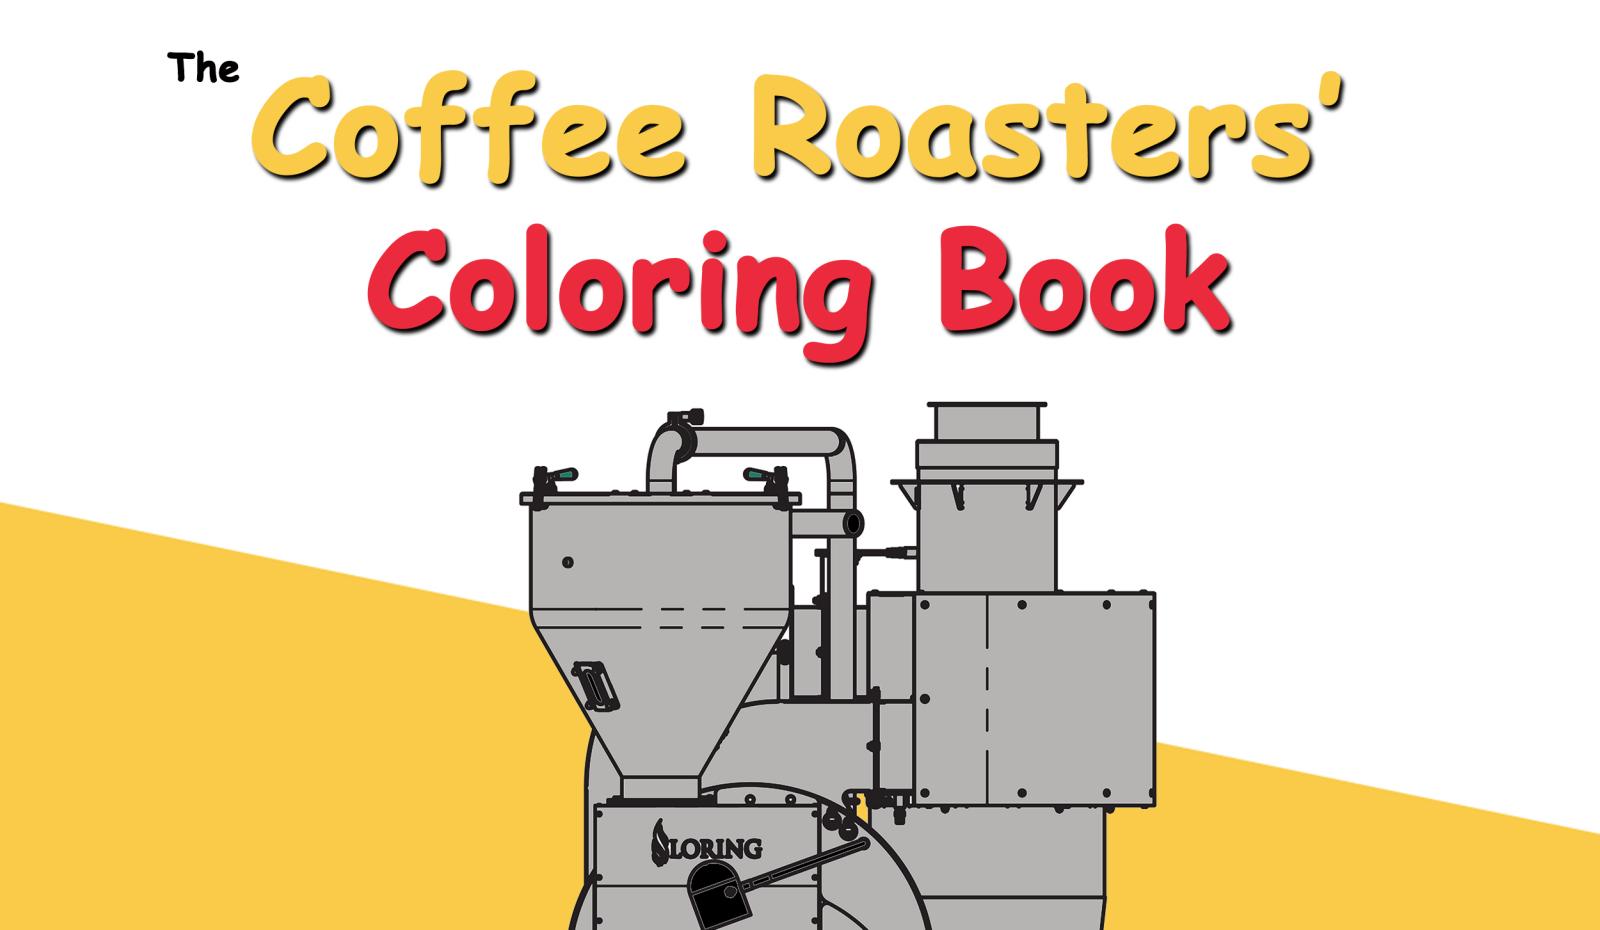 coffee roasters' coloring book